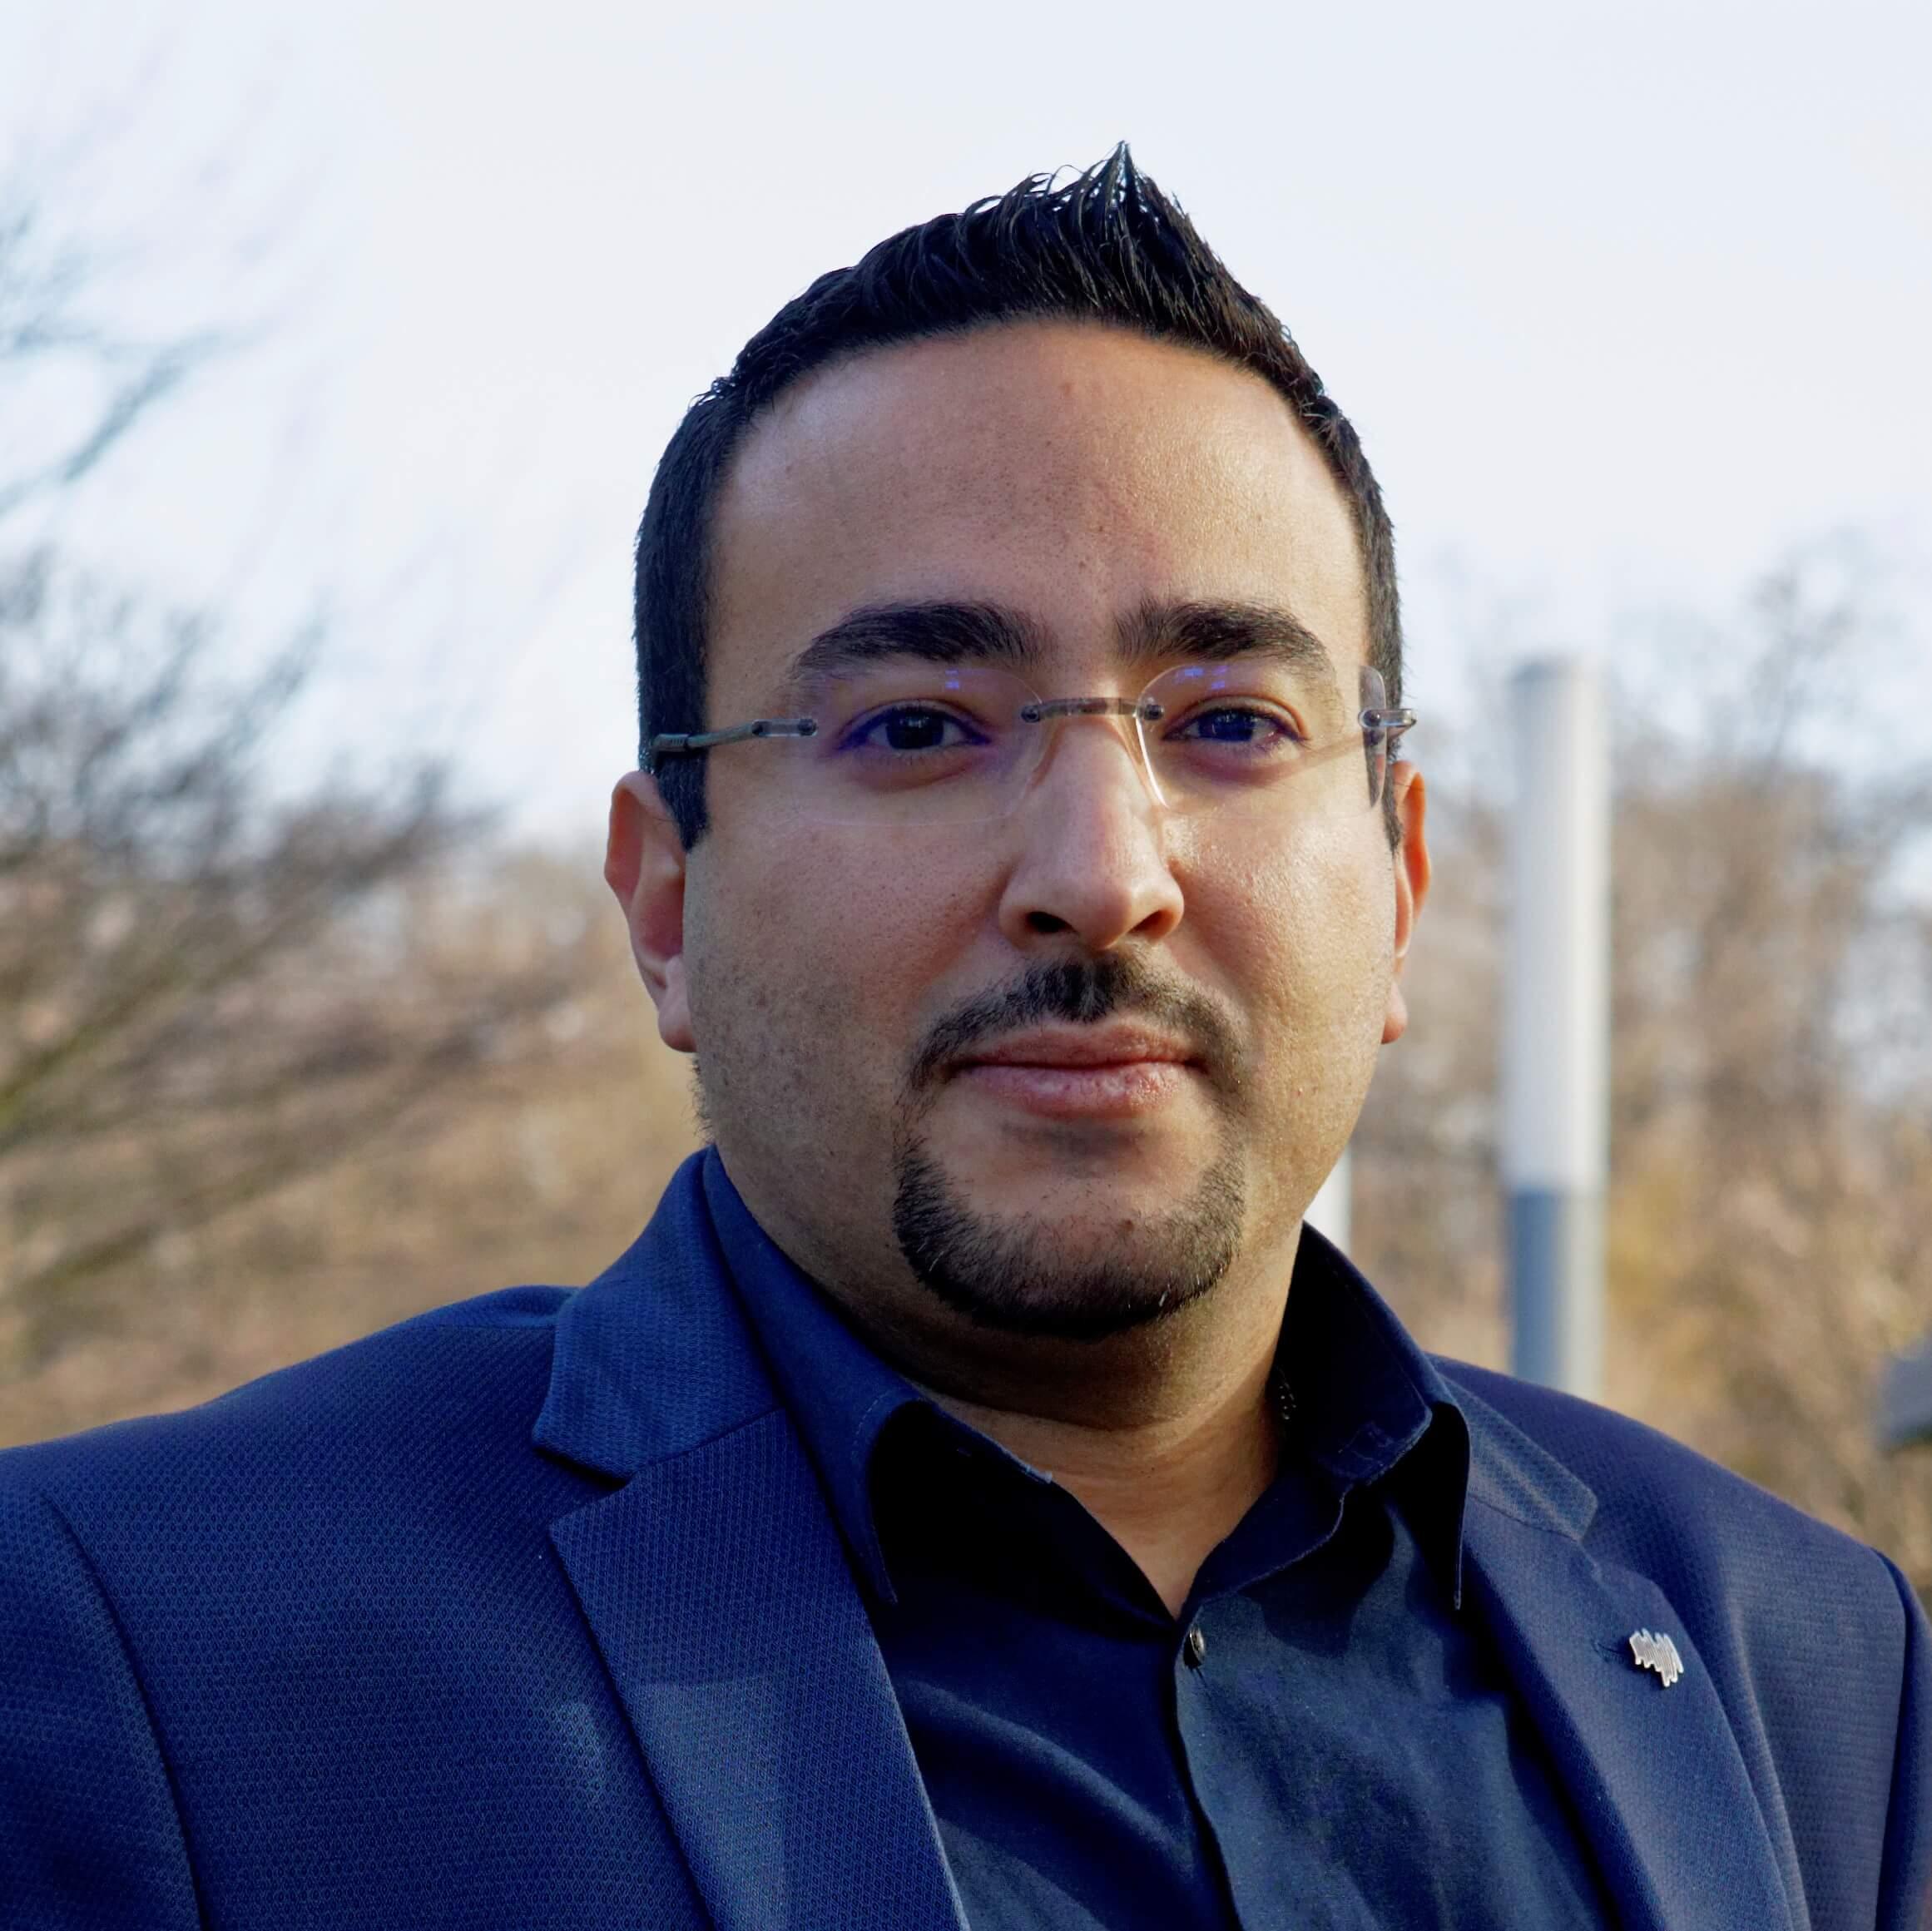 Hicham Boustit